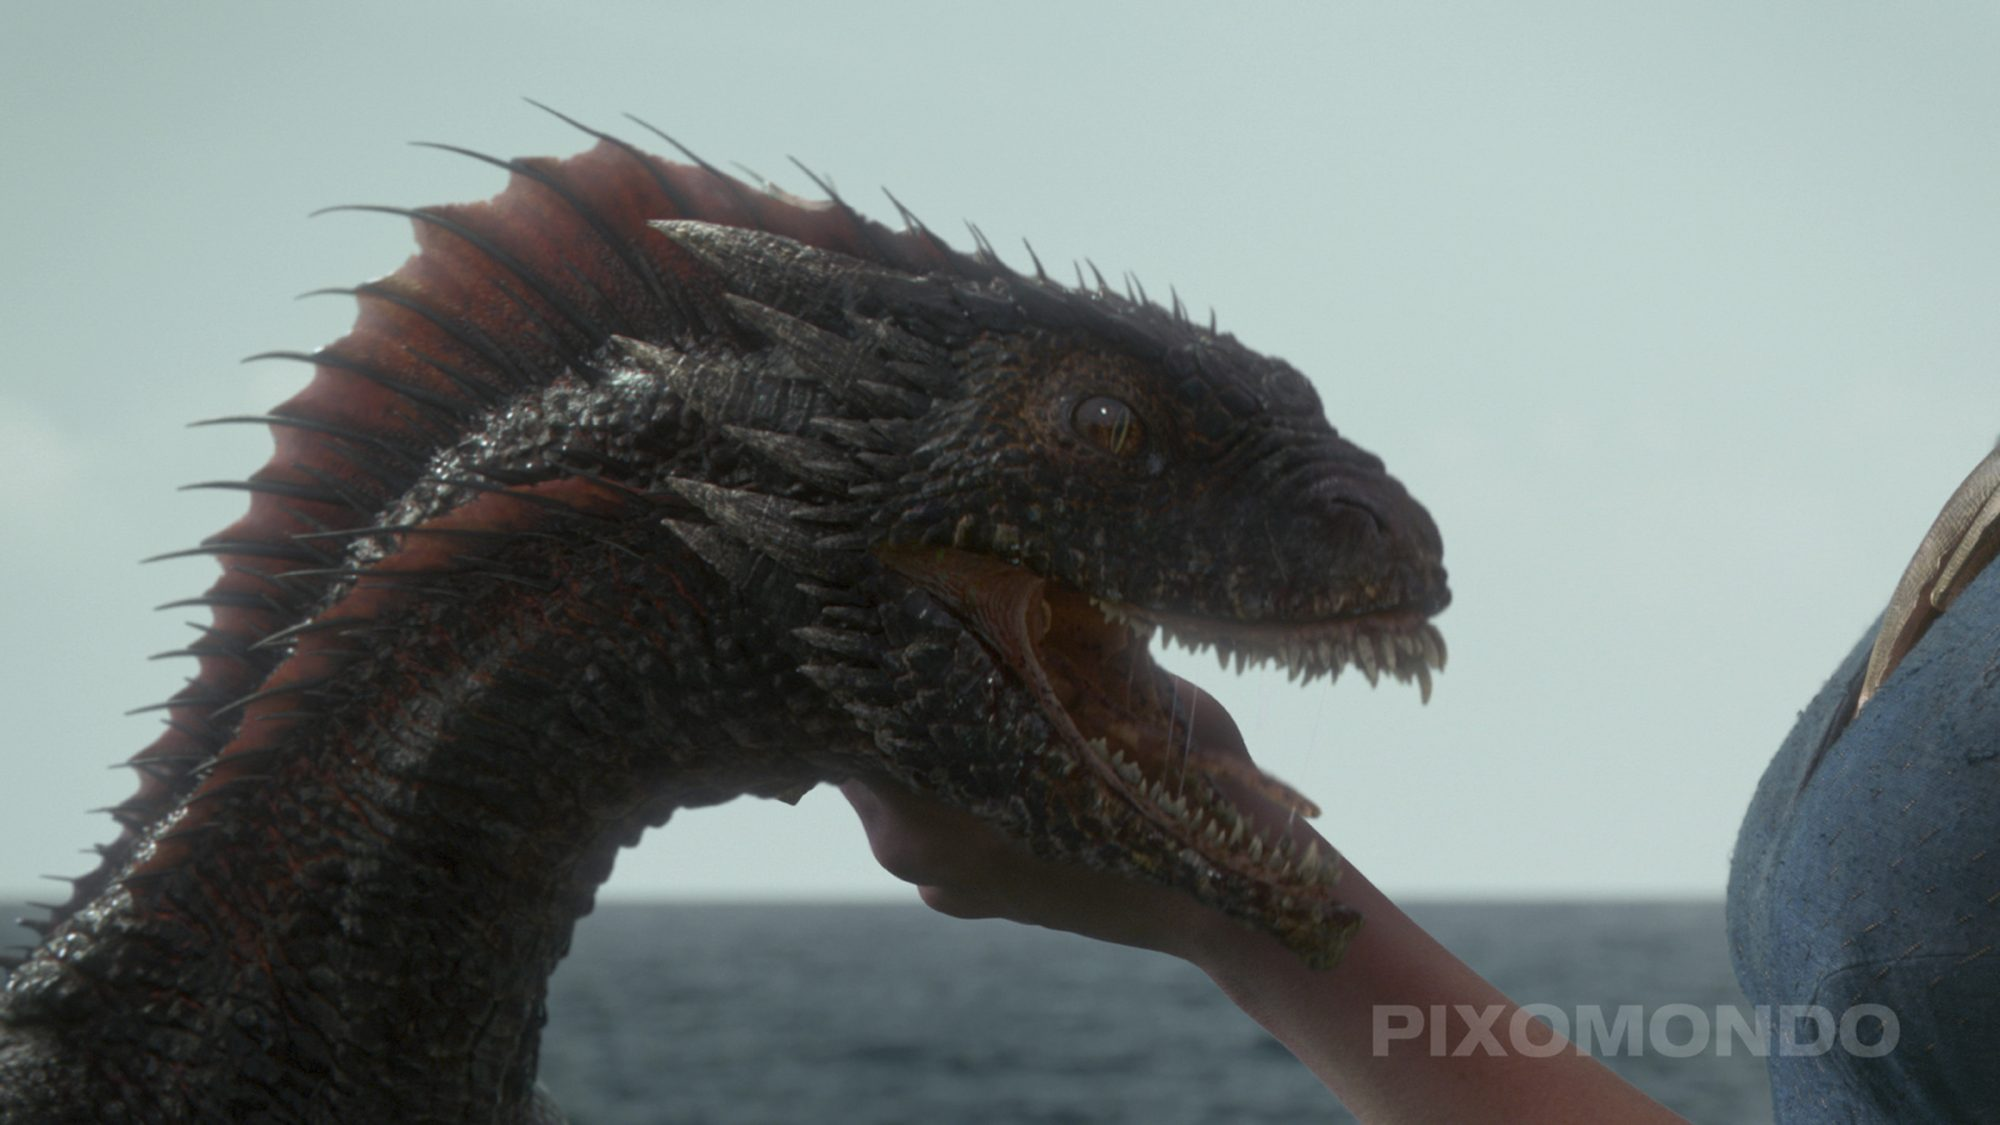 Game of Thrones BTSSeason 3DragonsCR: HBO